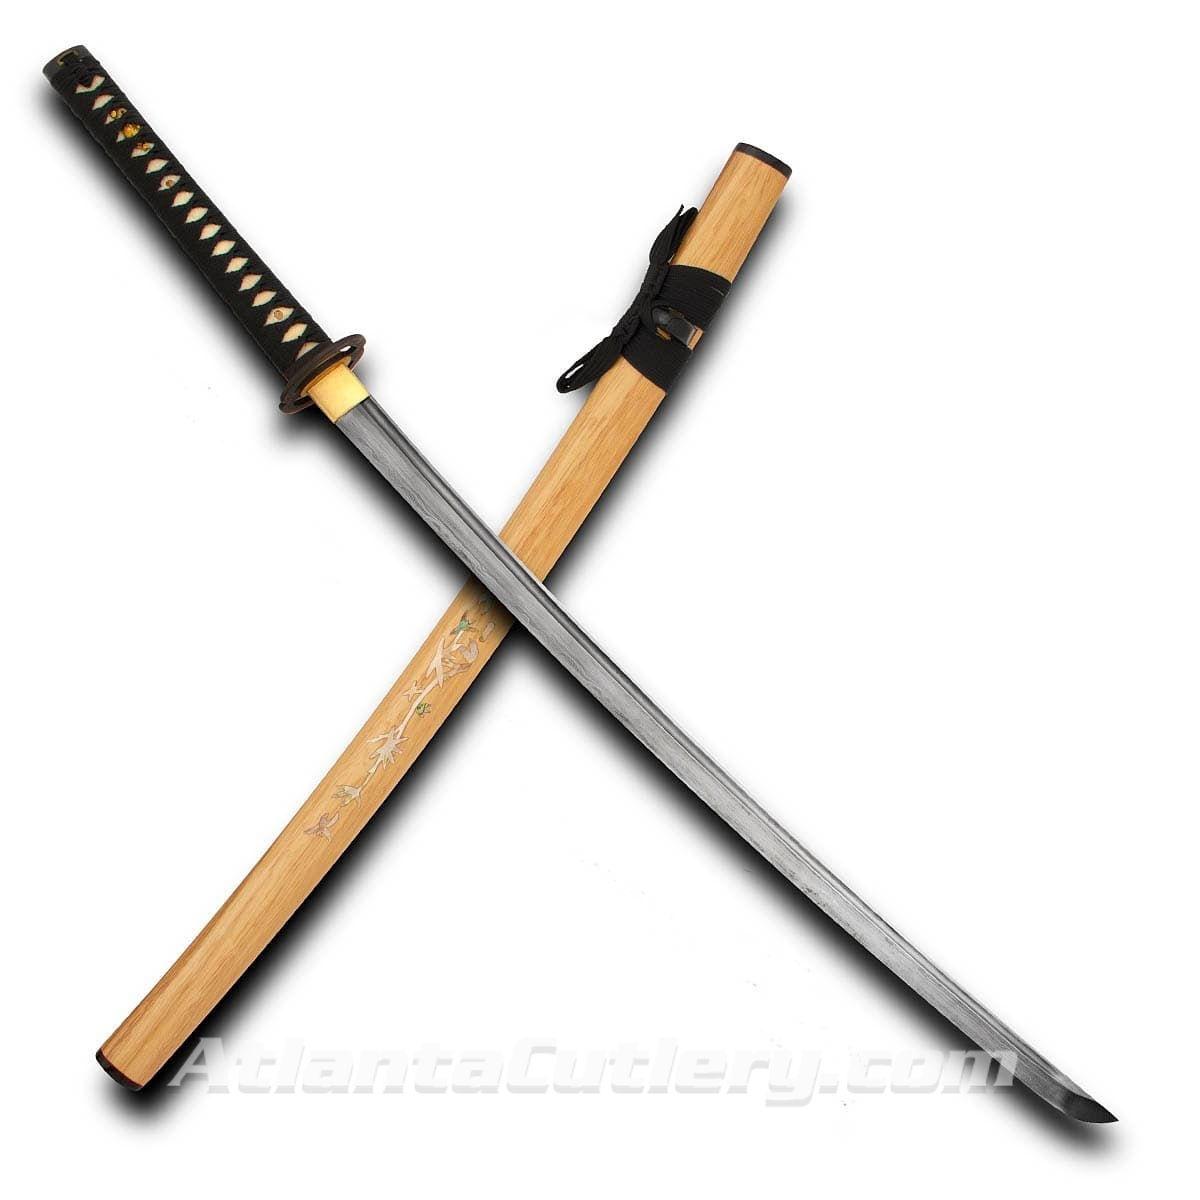 Hand Made Katana with Damascus Blade and Bamboo Motif in Abalone on Saya